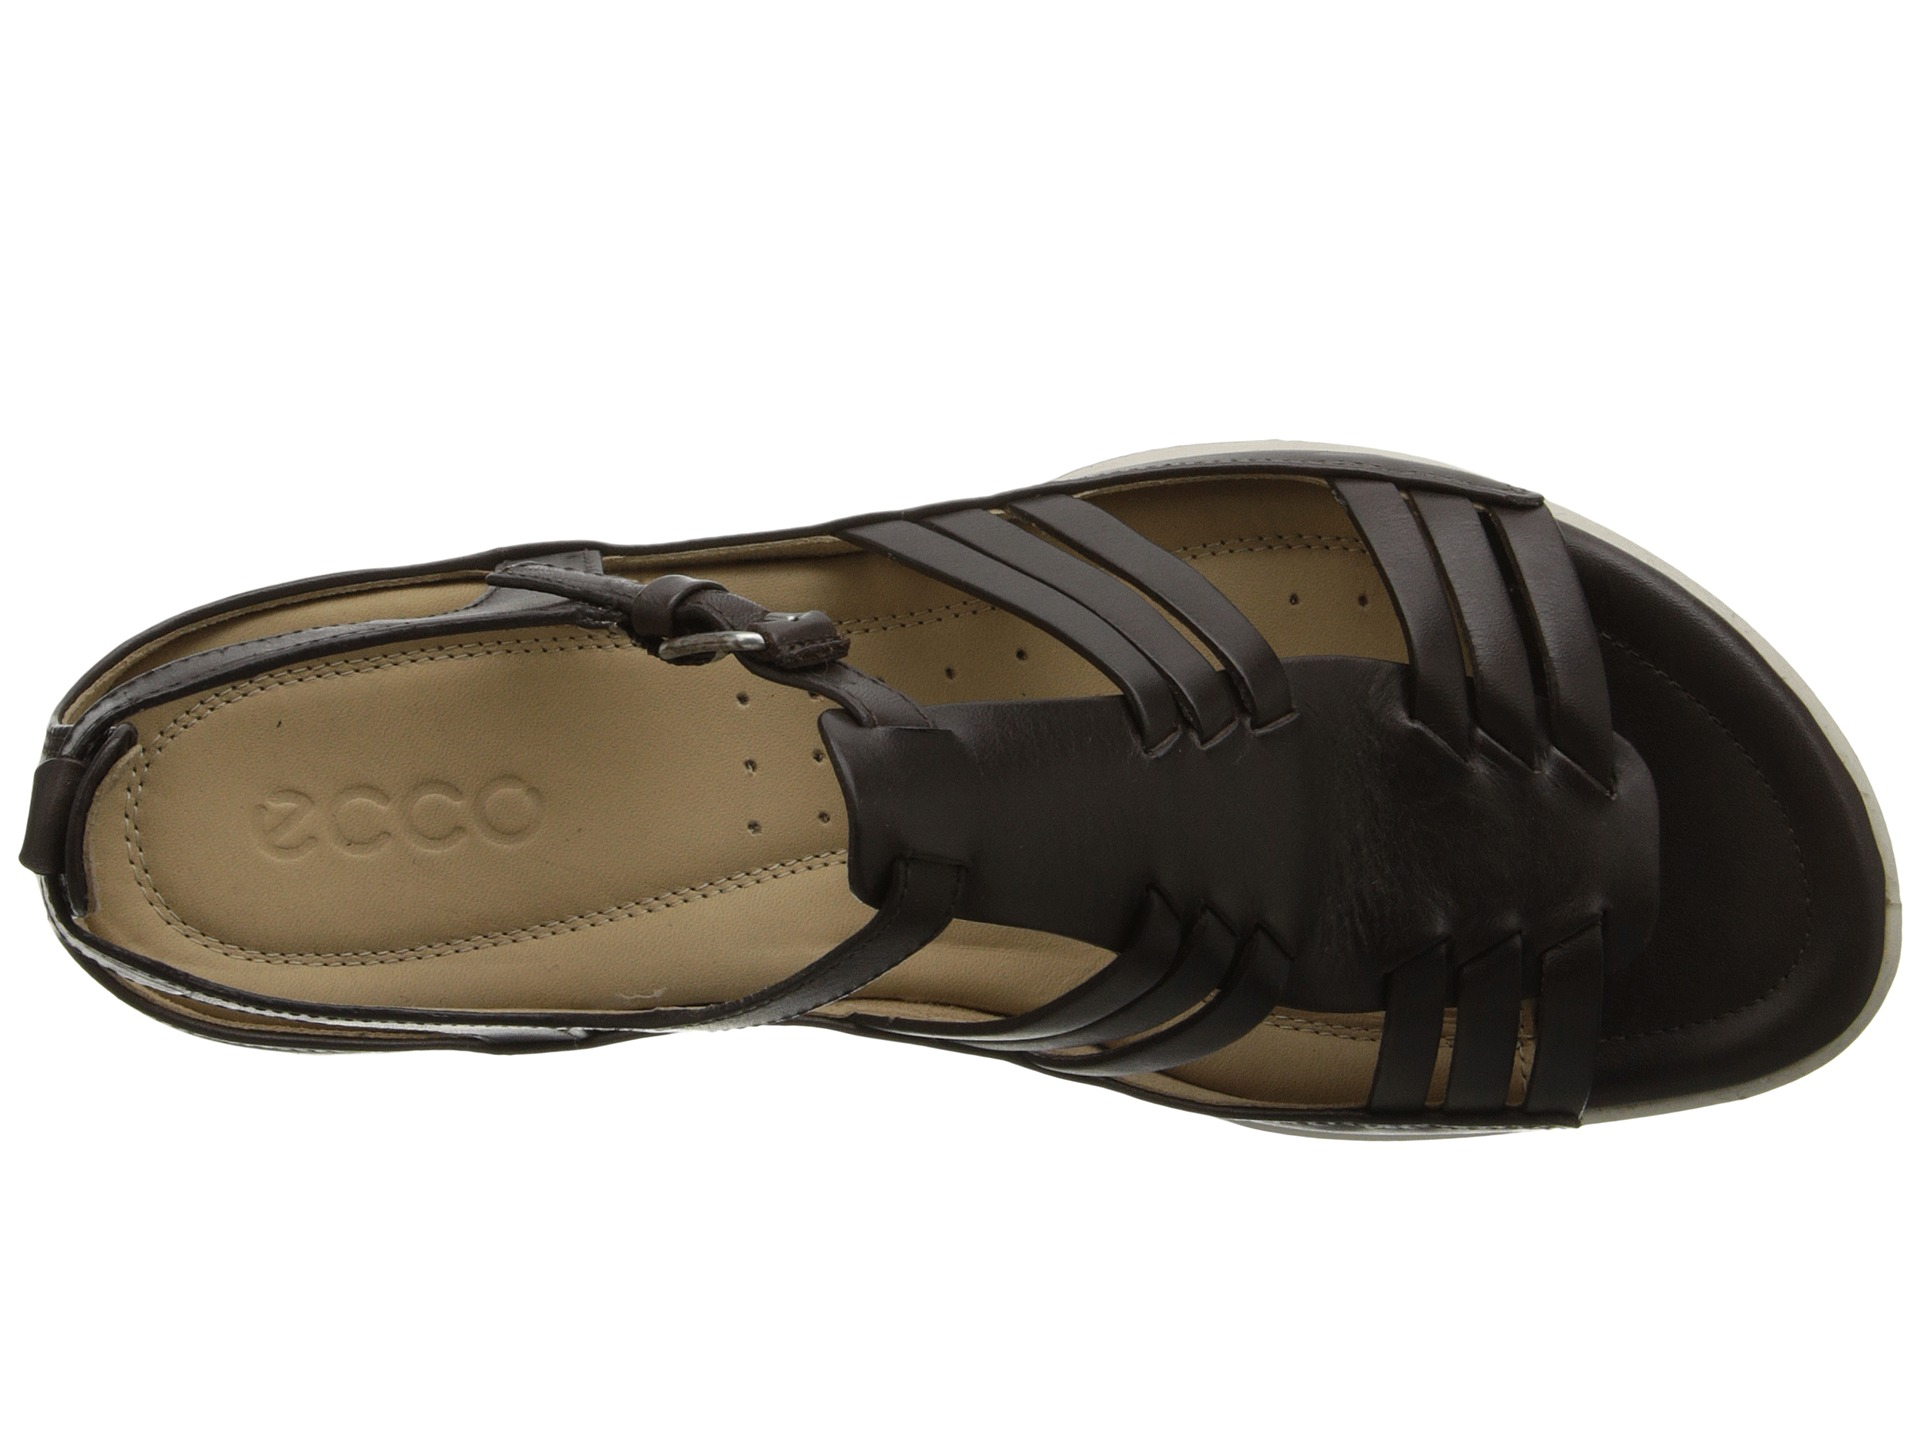 1cc153ee0752 Lyst - Ecco Flash Huarache Sandal in Brown